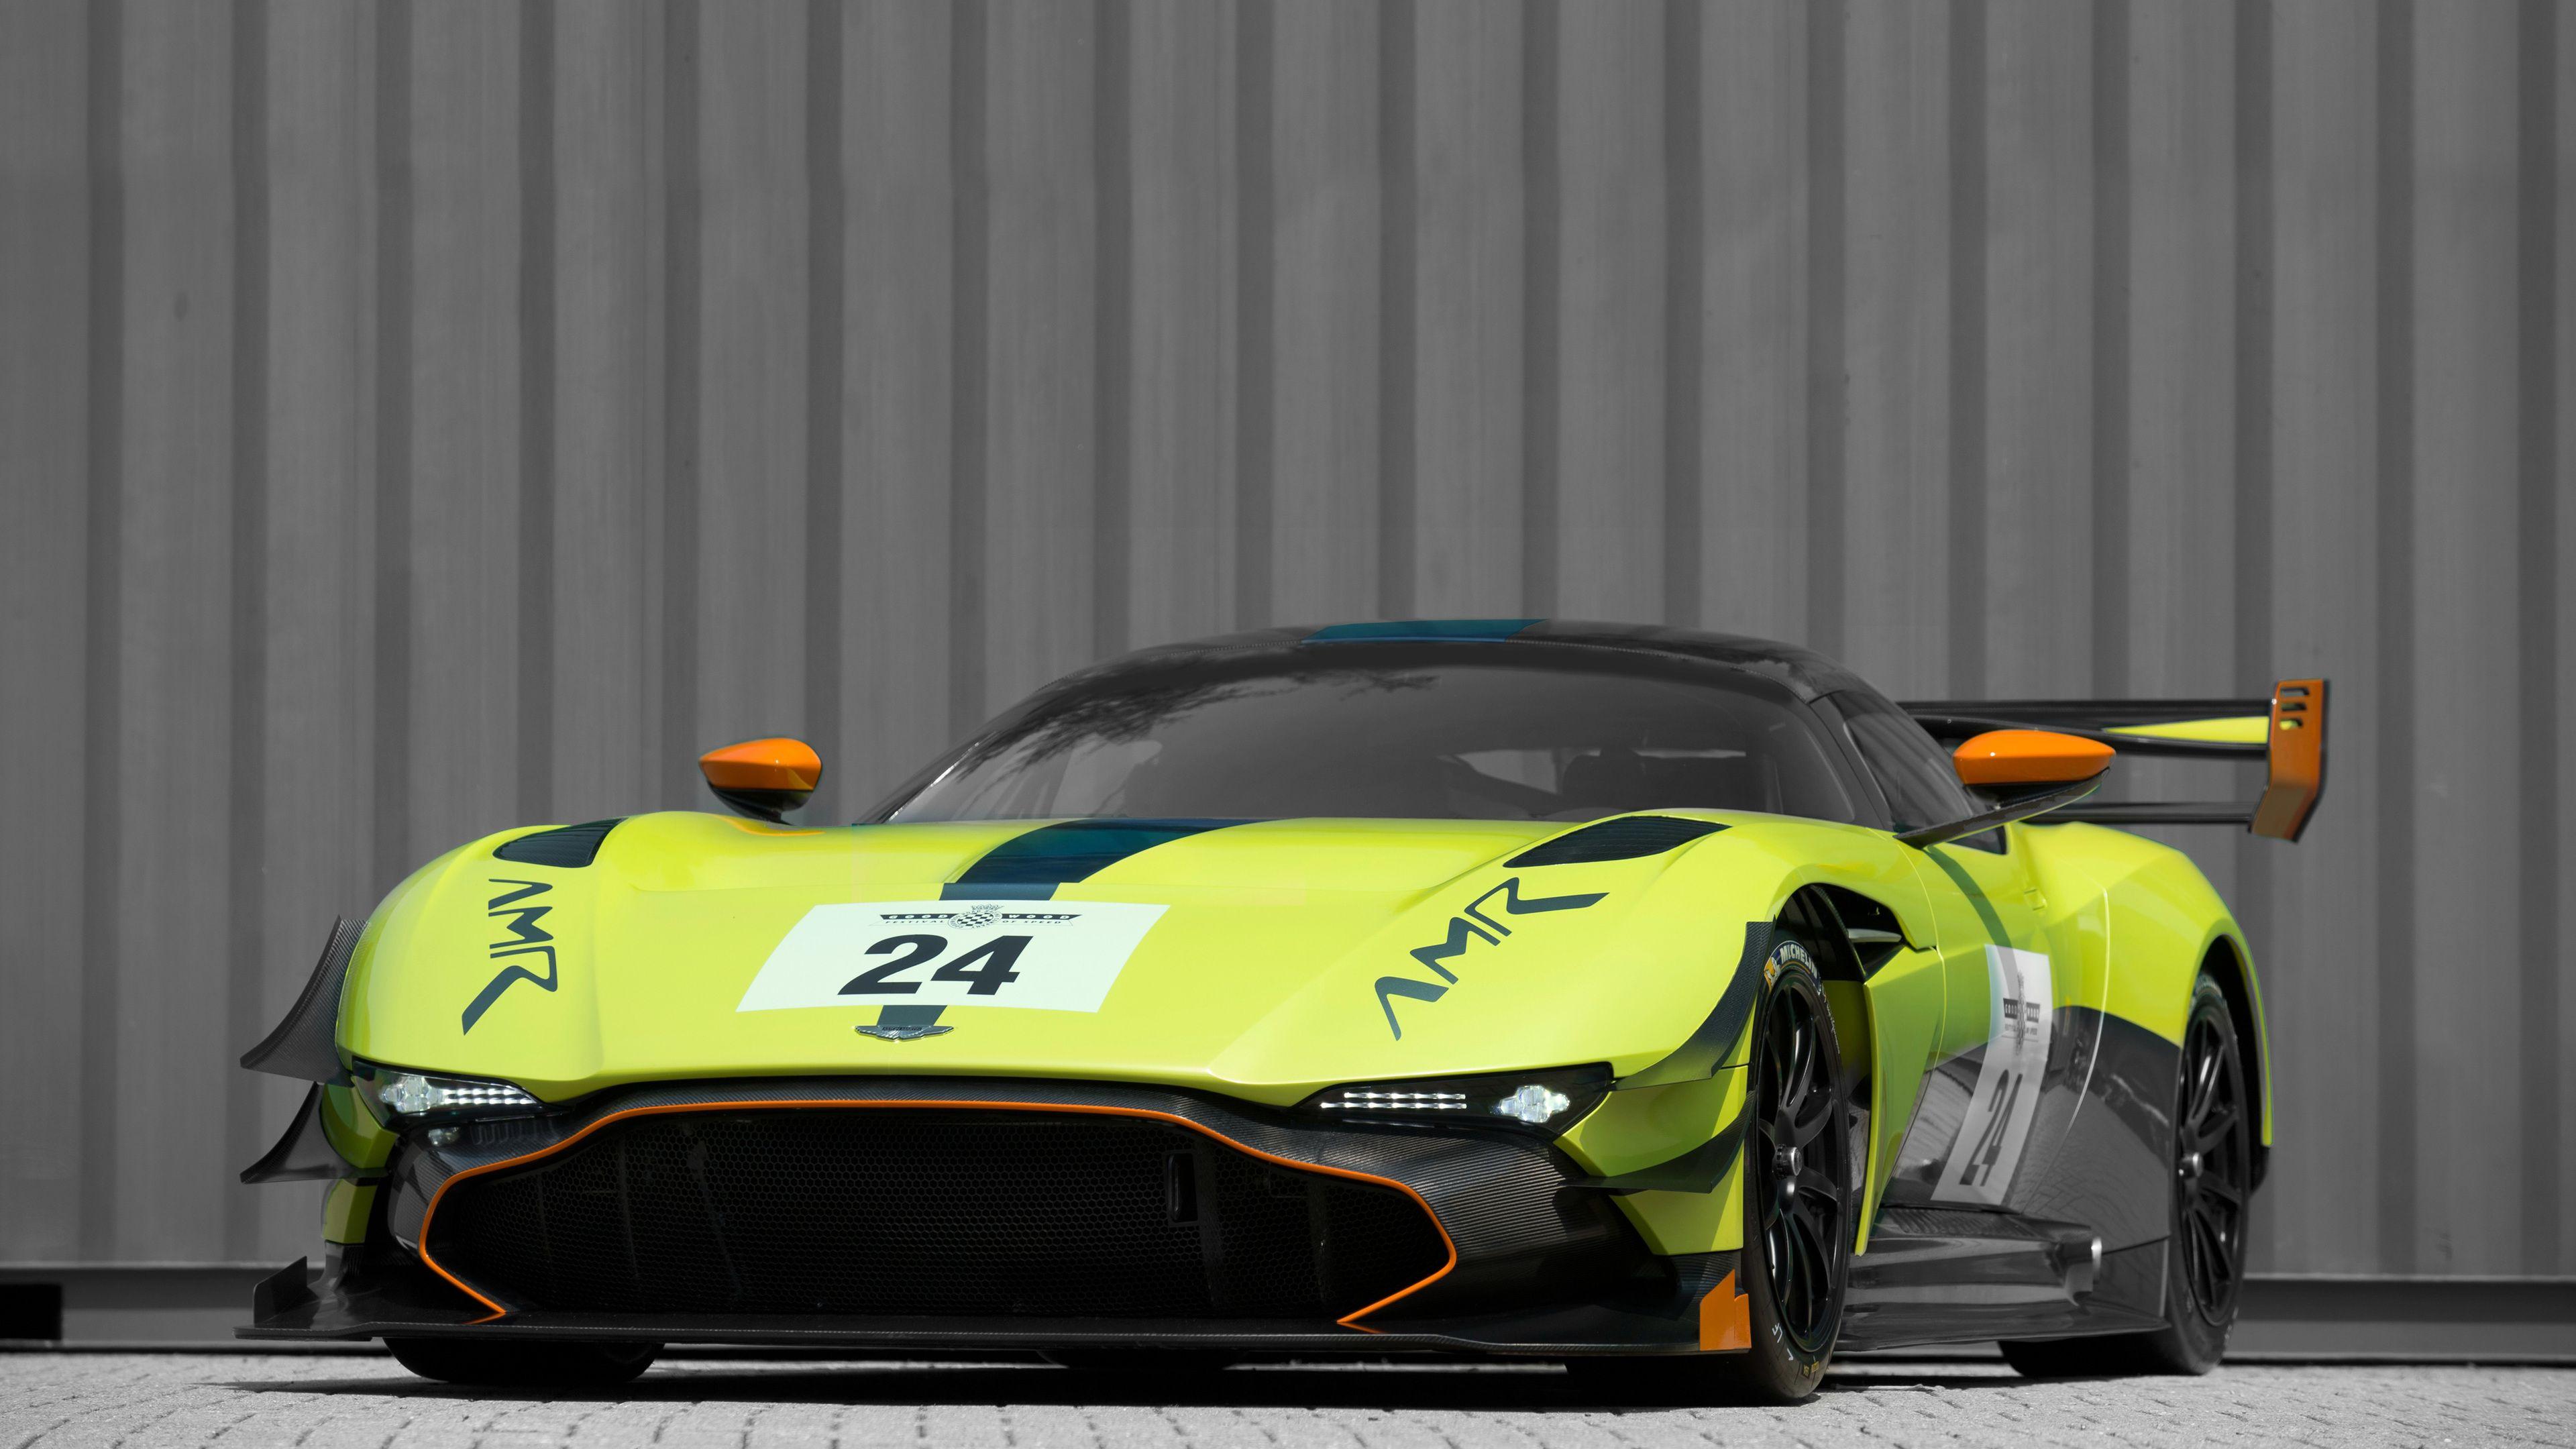 Wallpaper 4k Aston Martin Vulcan Amr Pro 2018 Cars Wallpapers 4k